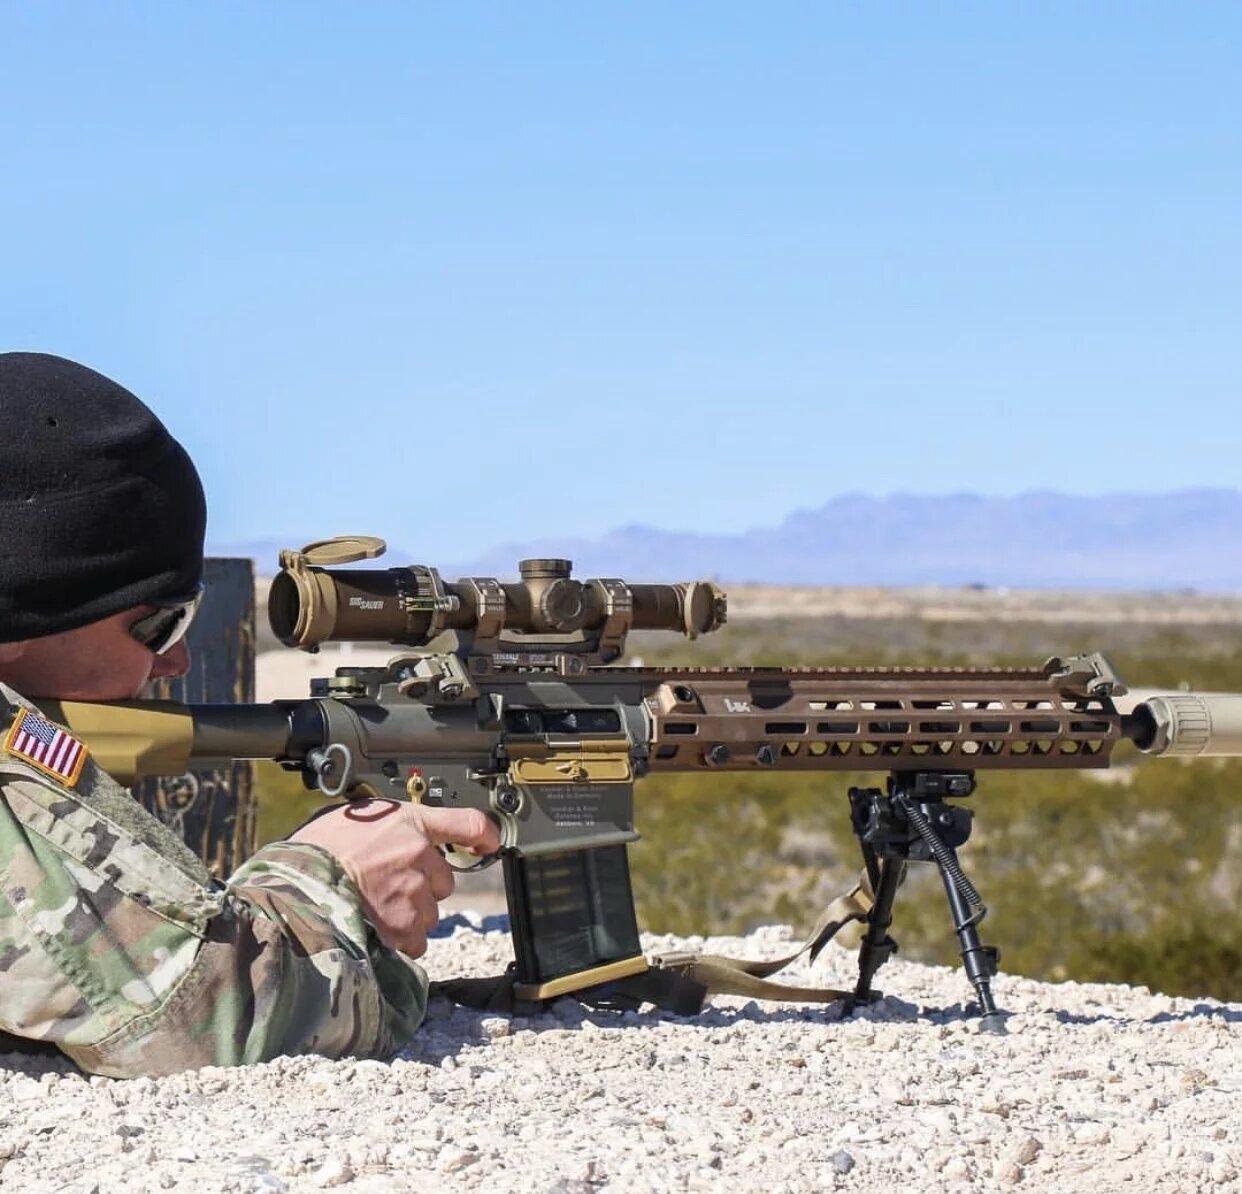 New Gun who dis? H&K SDMR.-a813c34fd82a665534e0985f5ab9b6e1-1-.jpg